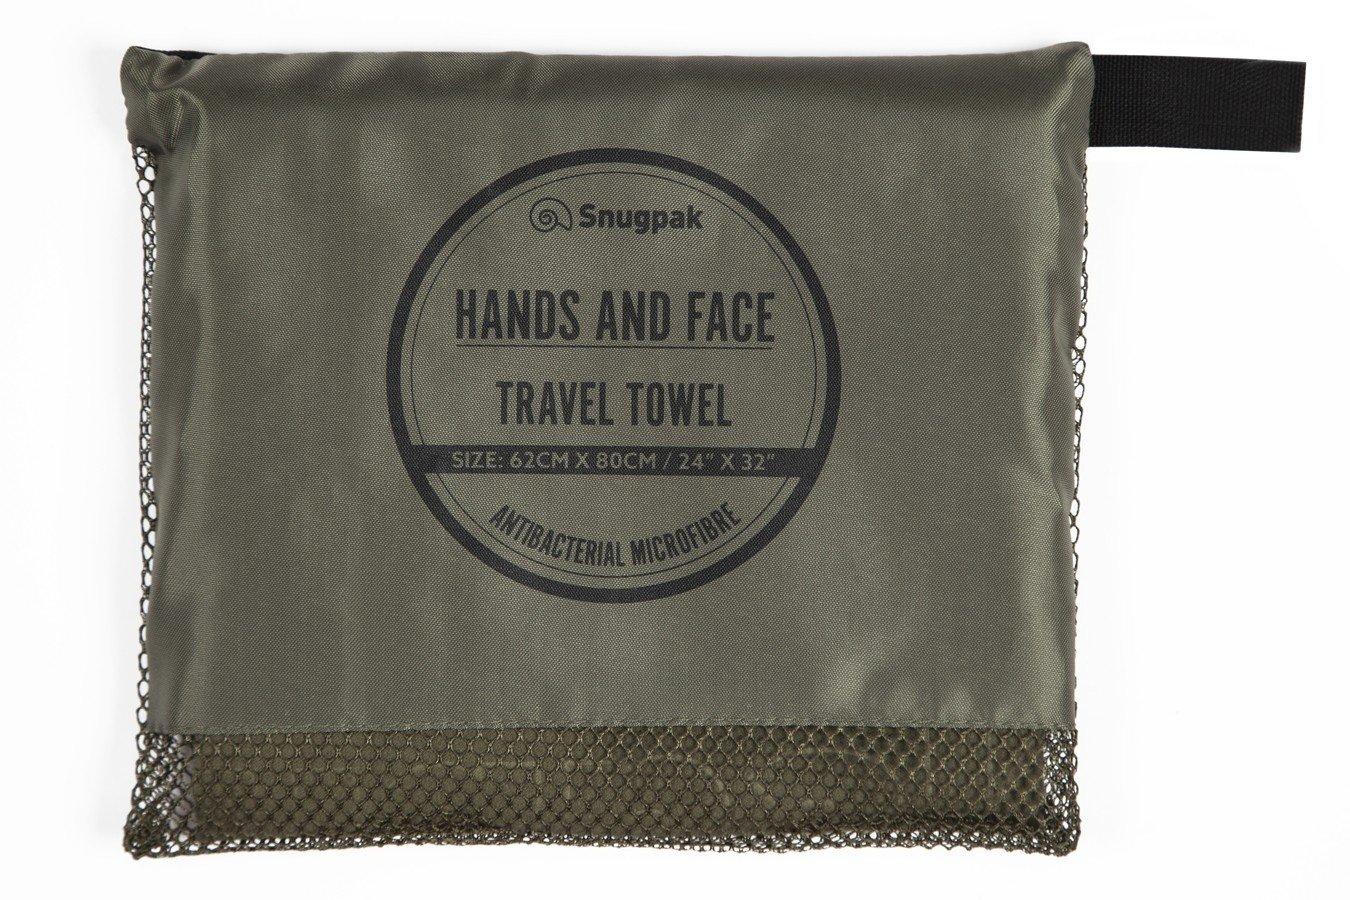 Snugpak Travel Towel Hands and Face Olive